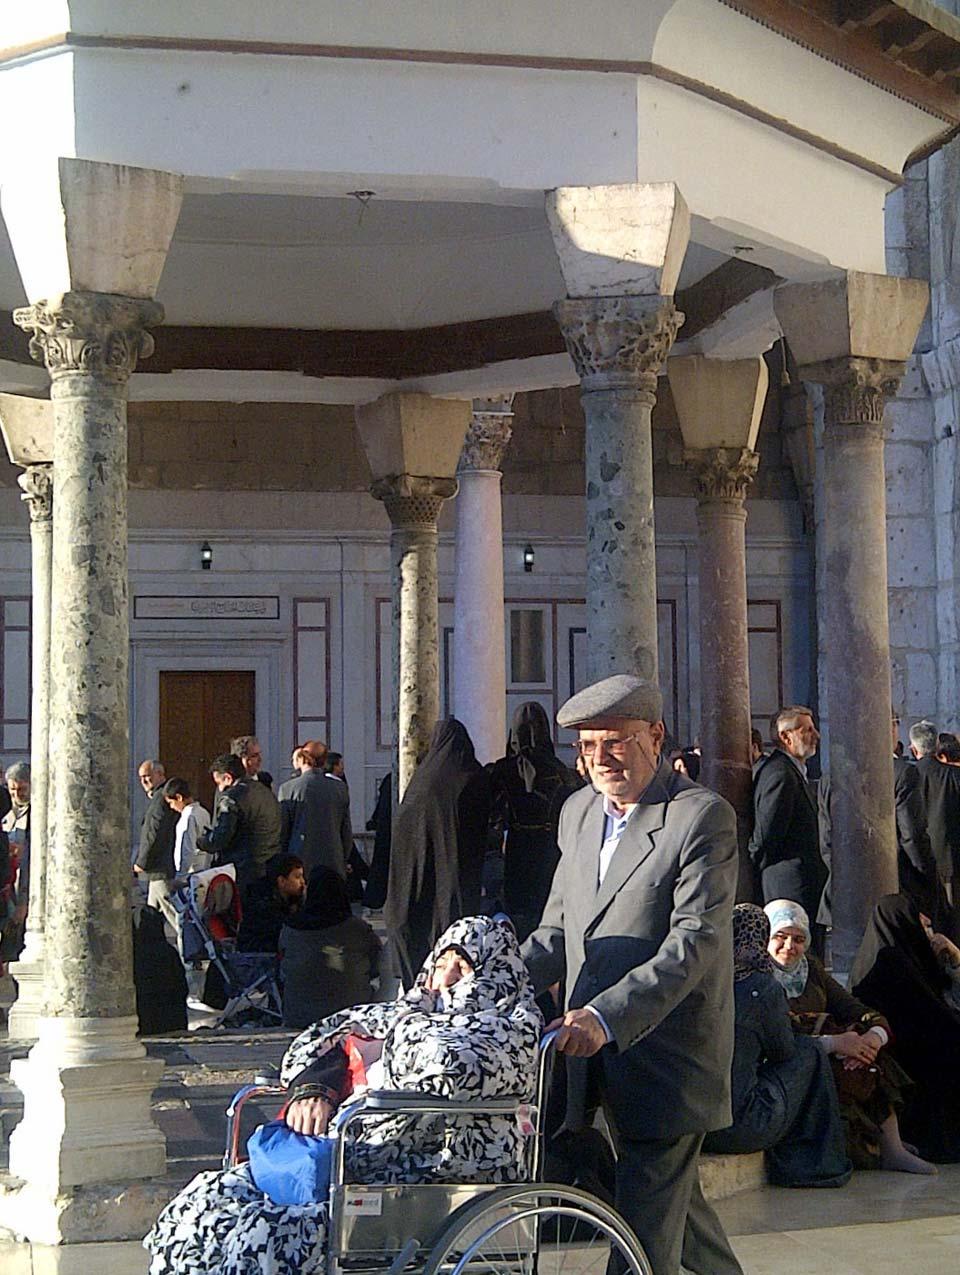 Pilgrims in the Umayyad Mosque courtyard. © Mark Lowey.